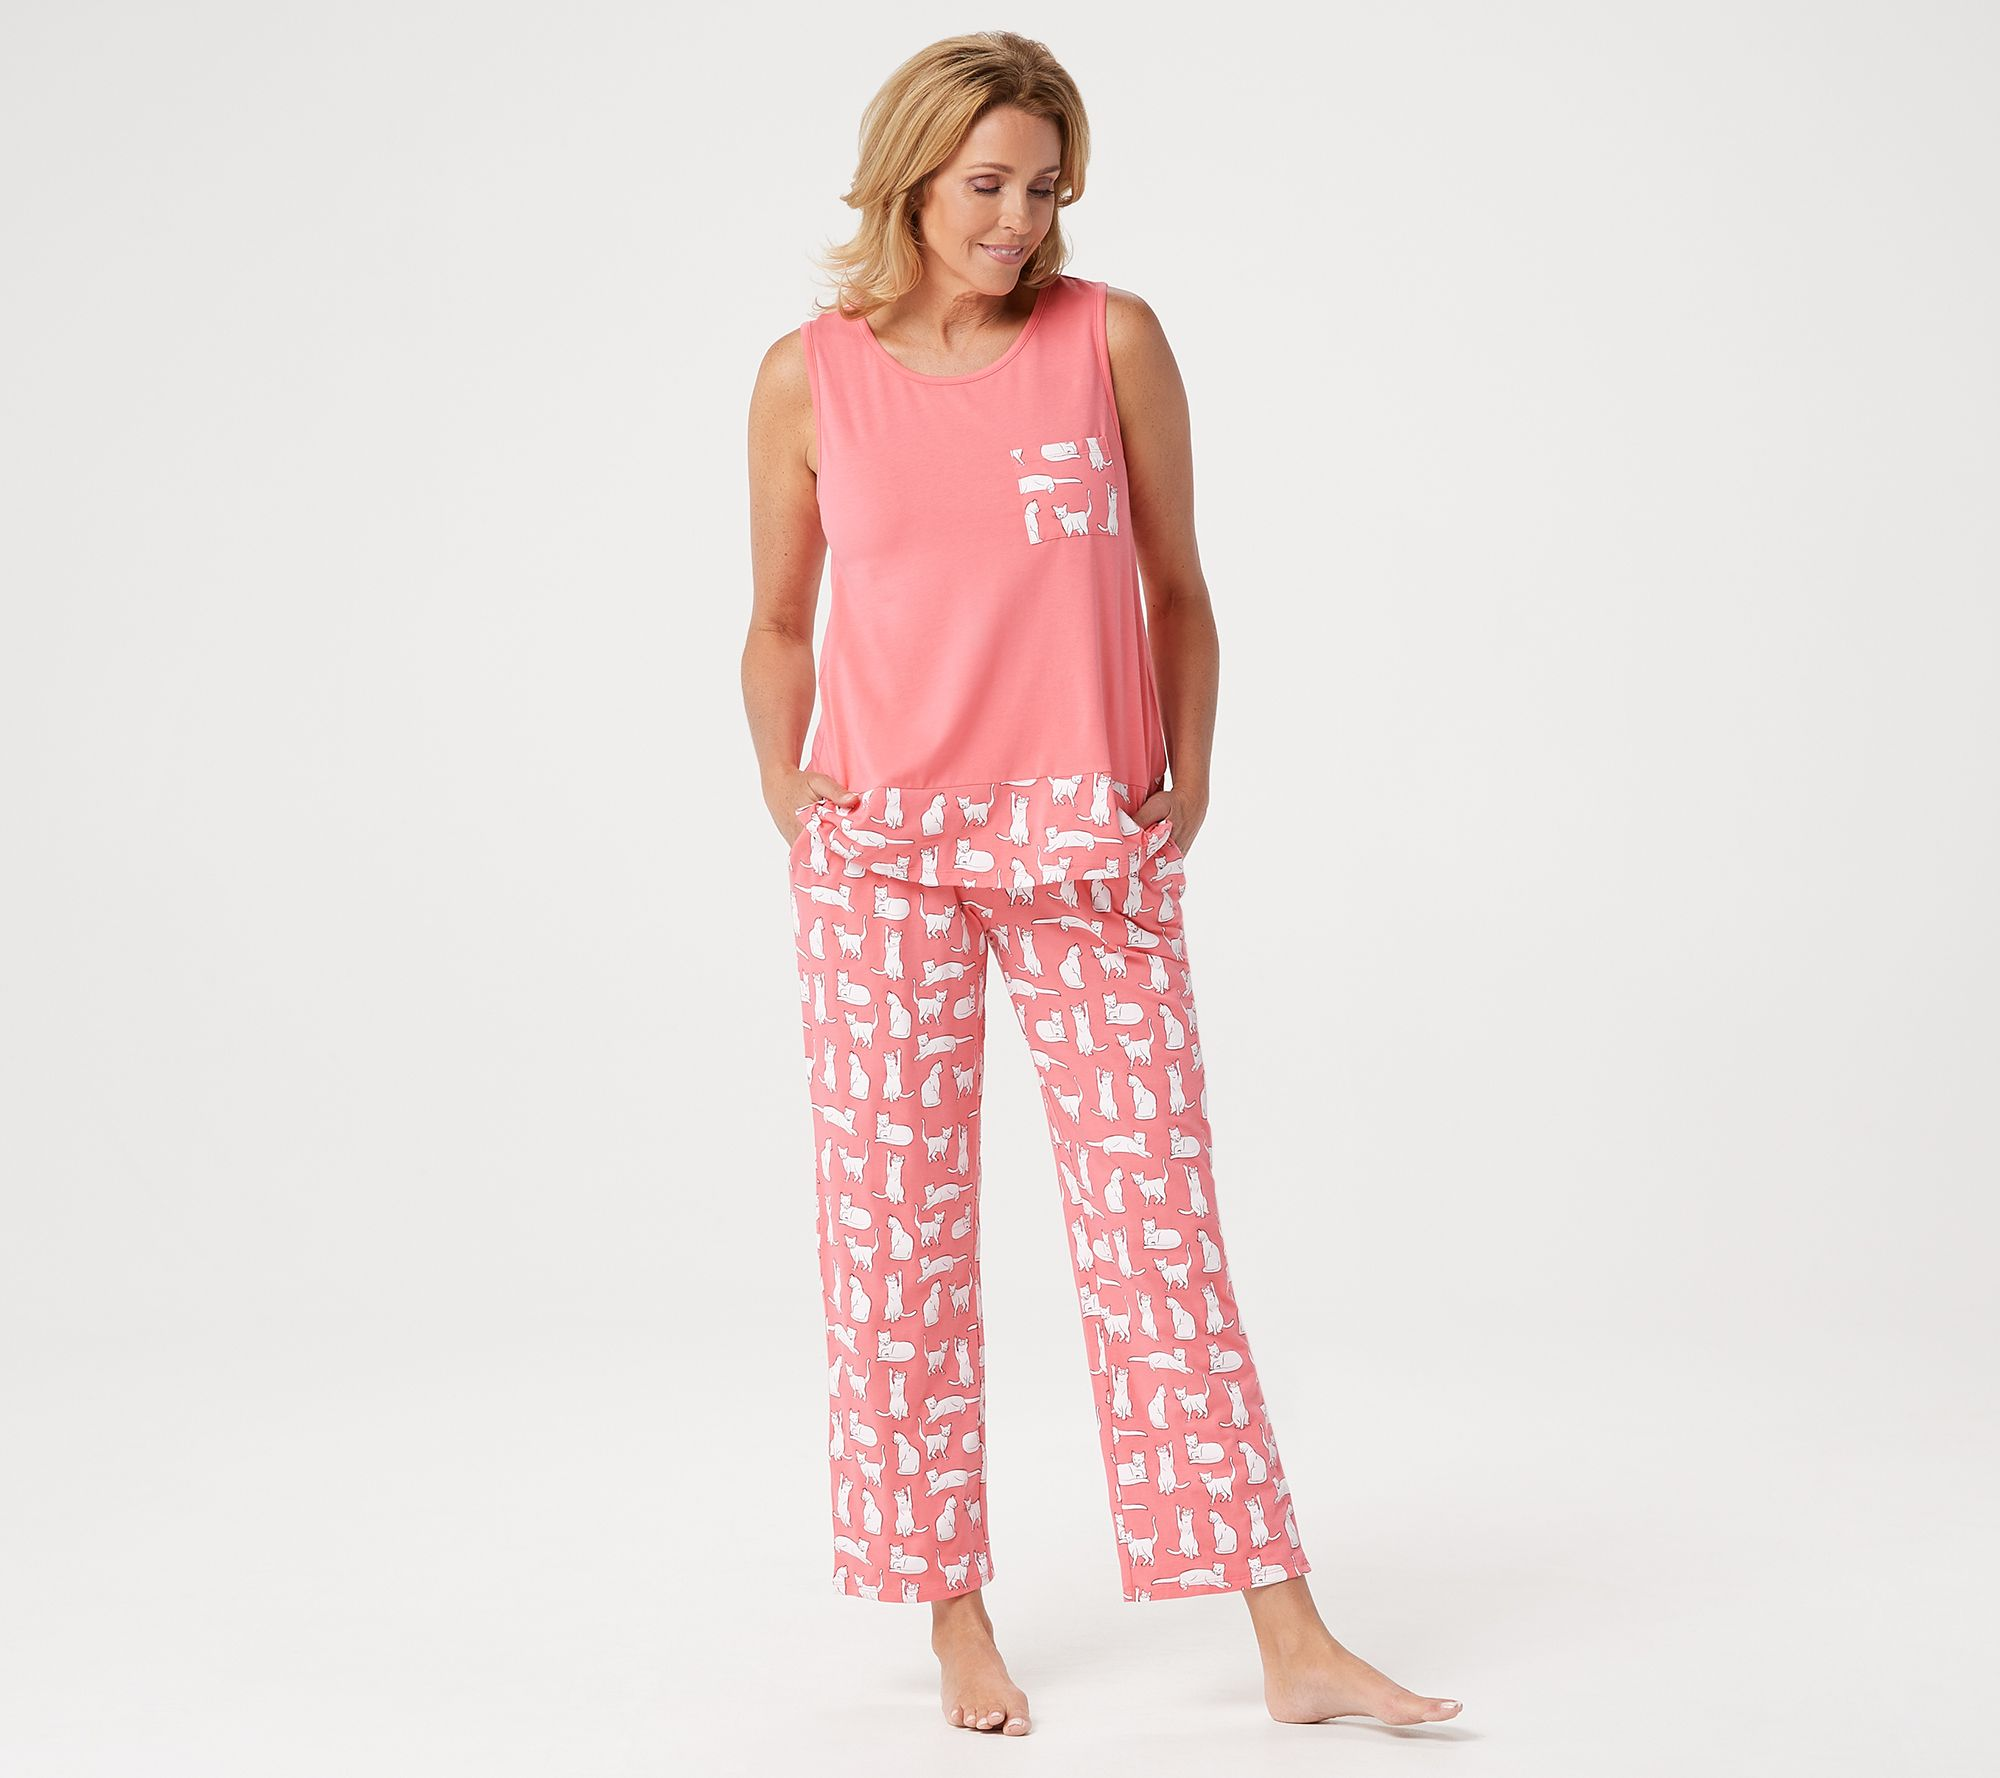 Womens Rock Star Pajama Comfy Lounge Pj Pants Yellow Pink Plus Size 1X 2X 3X NEW